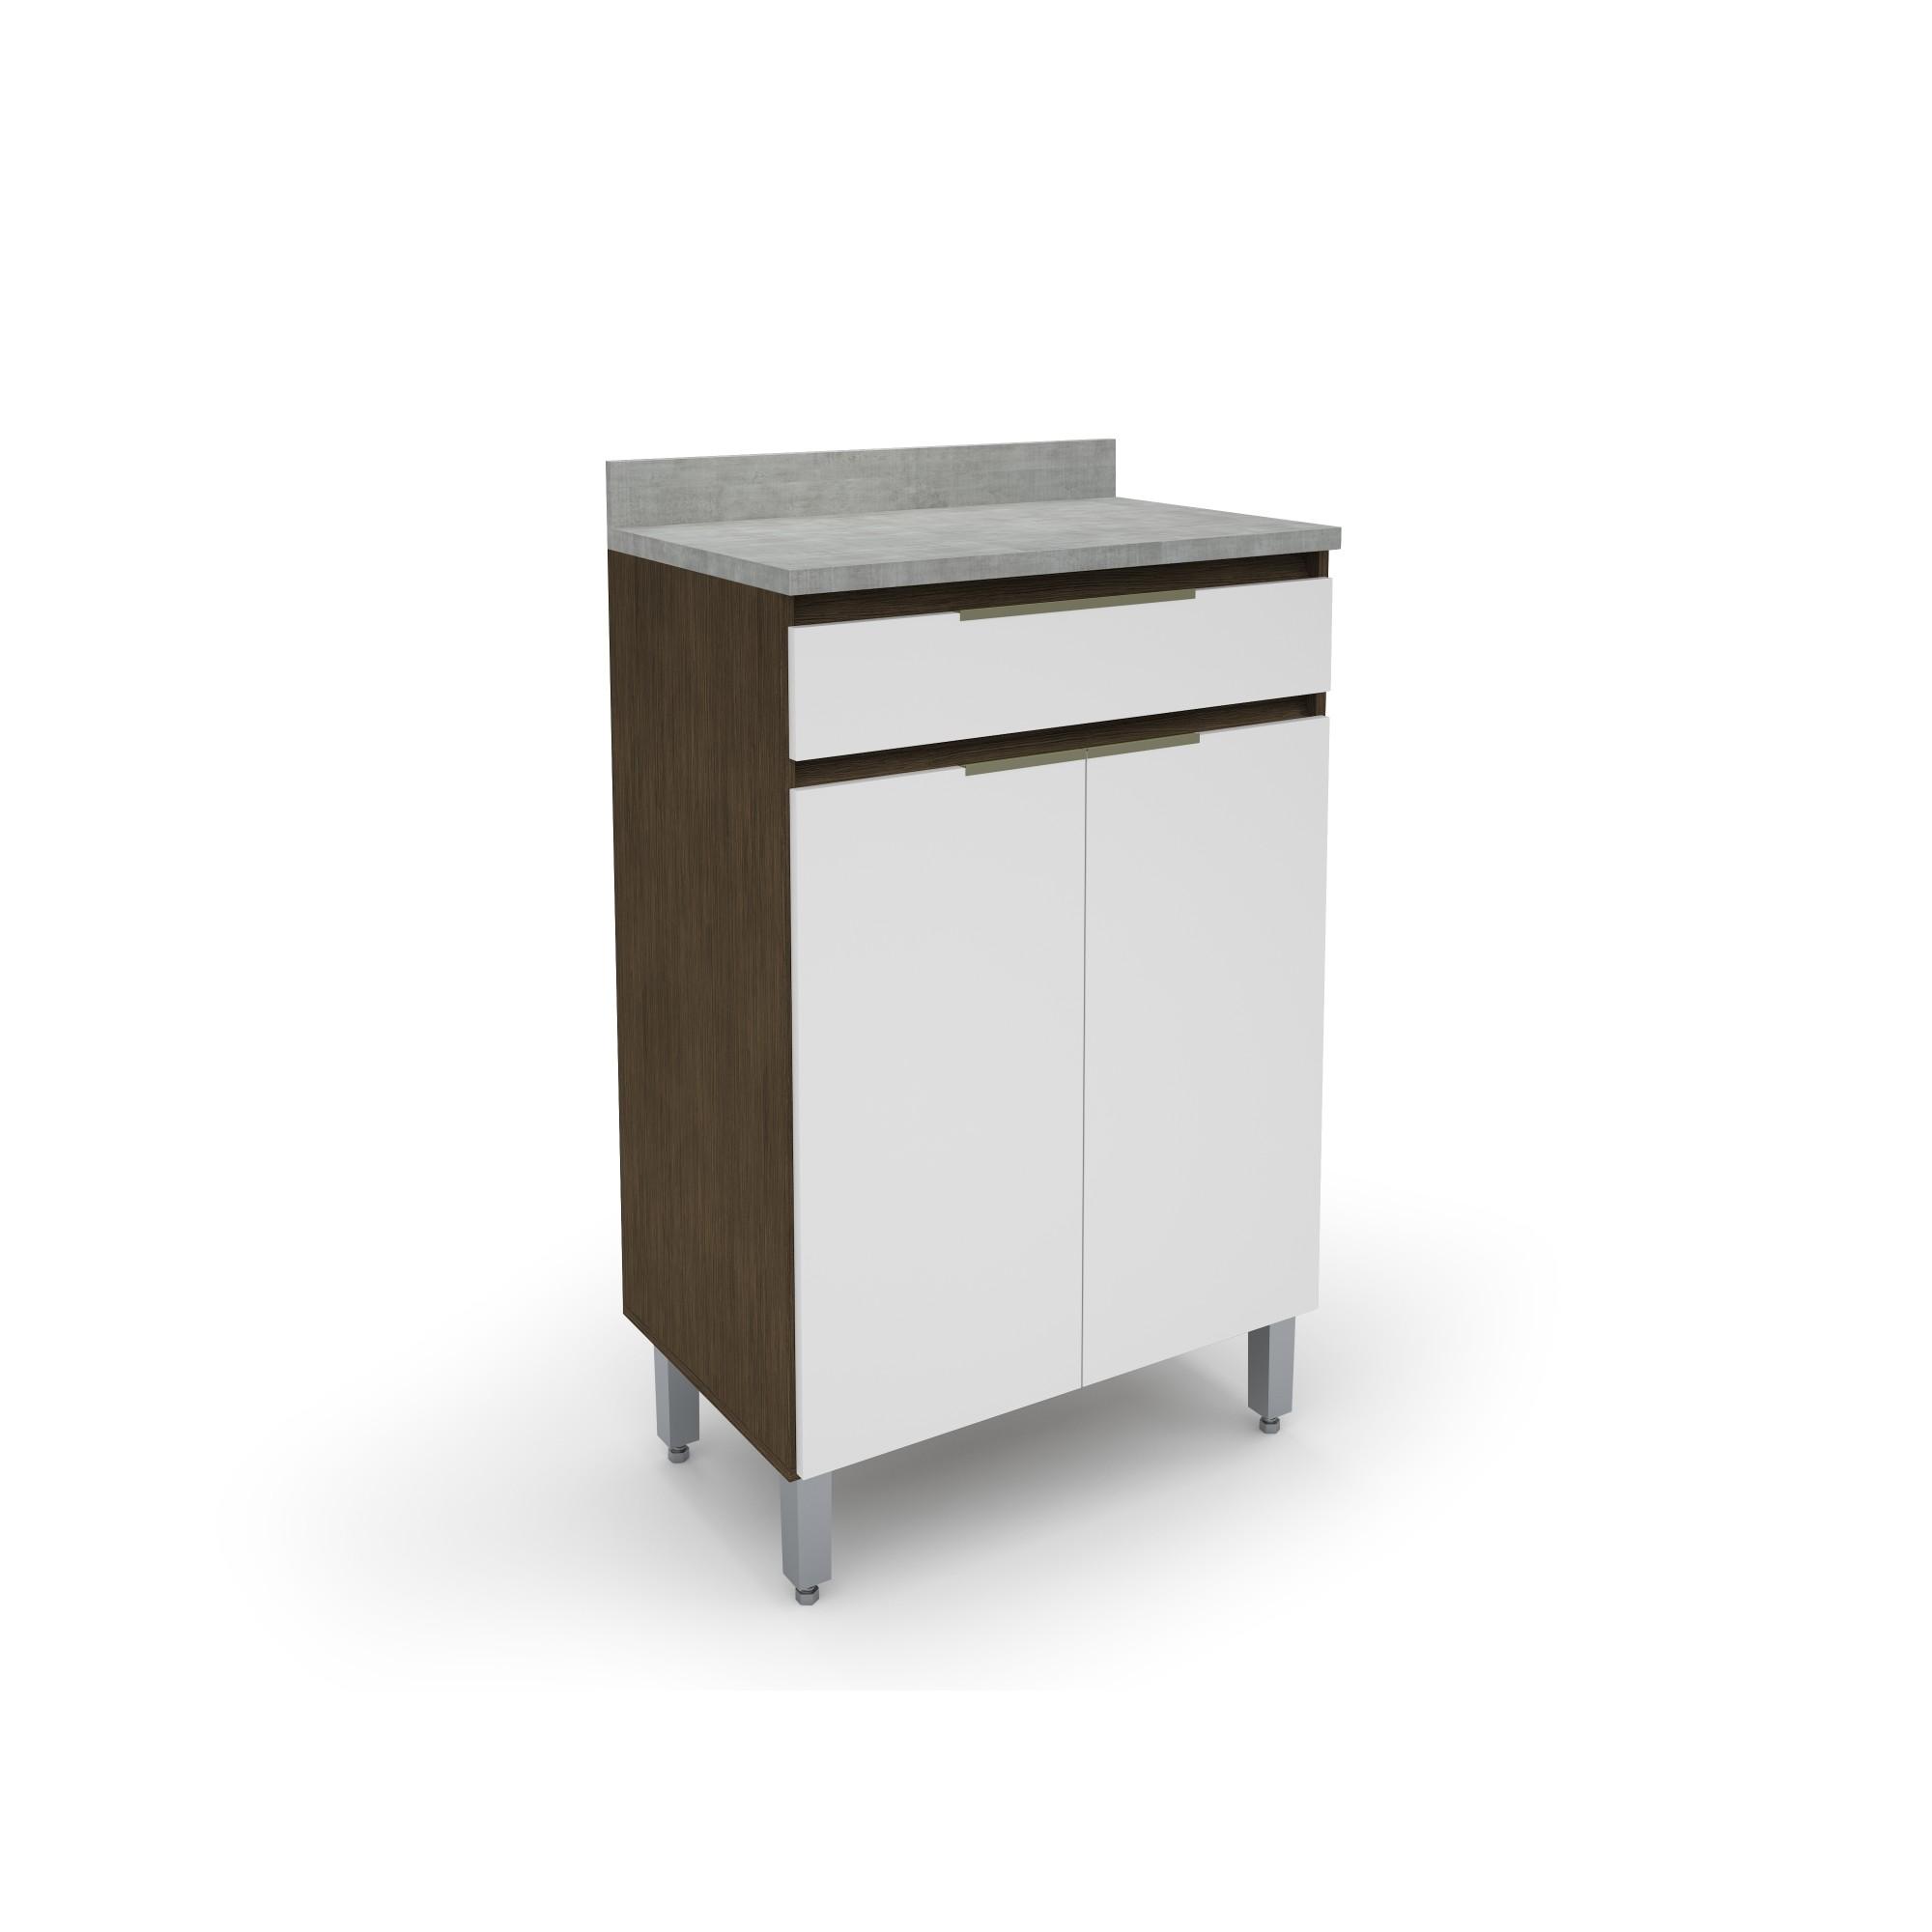 Gabinete Cozinha 2 Portas 1 Gaveta New Tannat Branco 70cm - Batrol